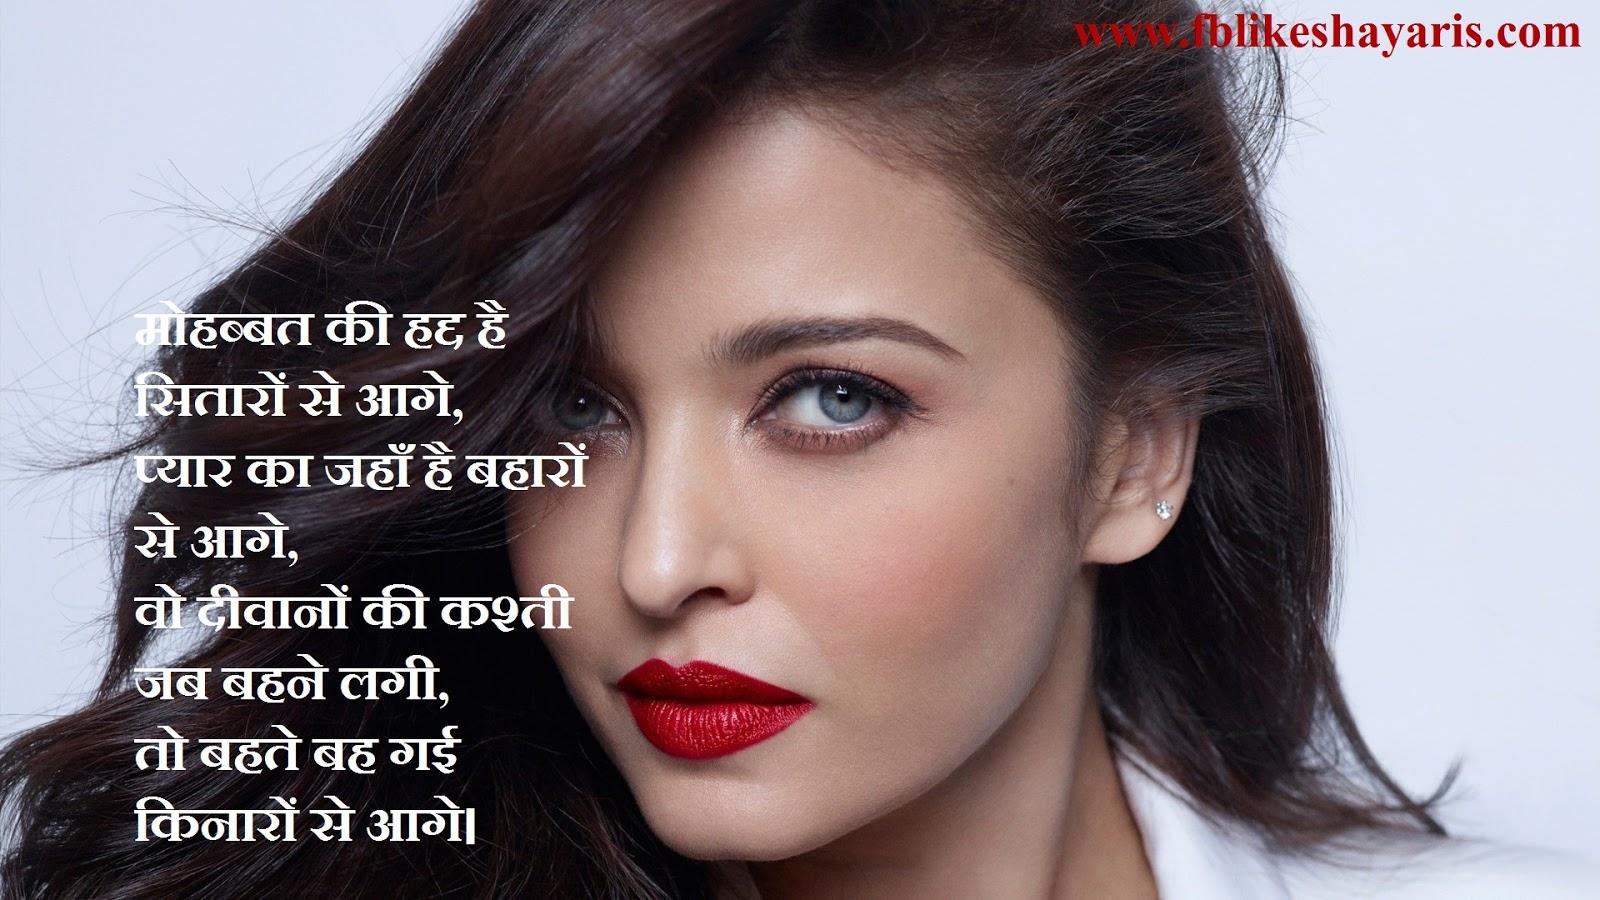 Mohobaat Ki Had He Sitaro Se Aage - Love Shayari